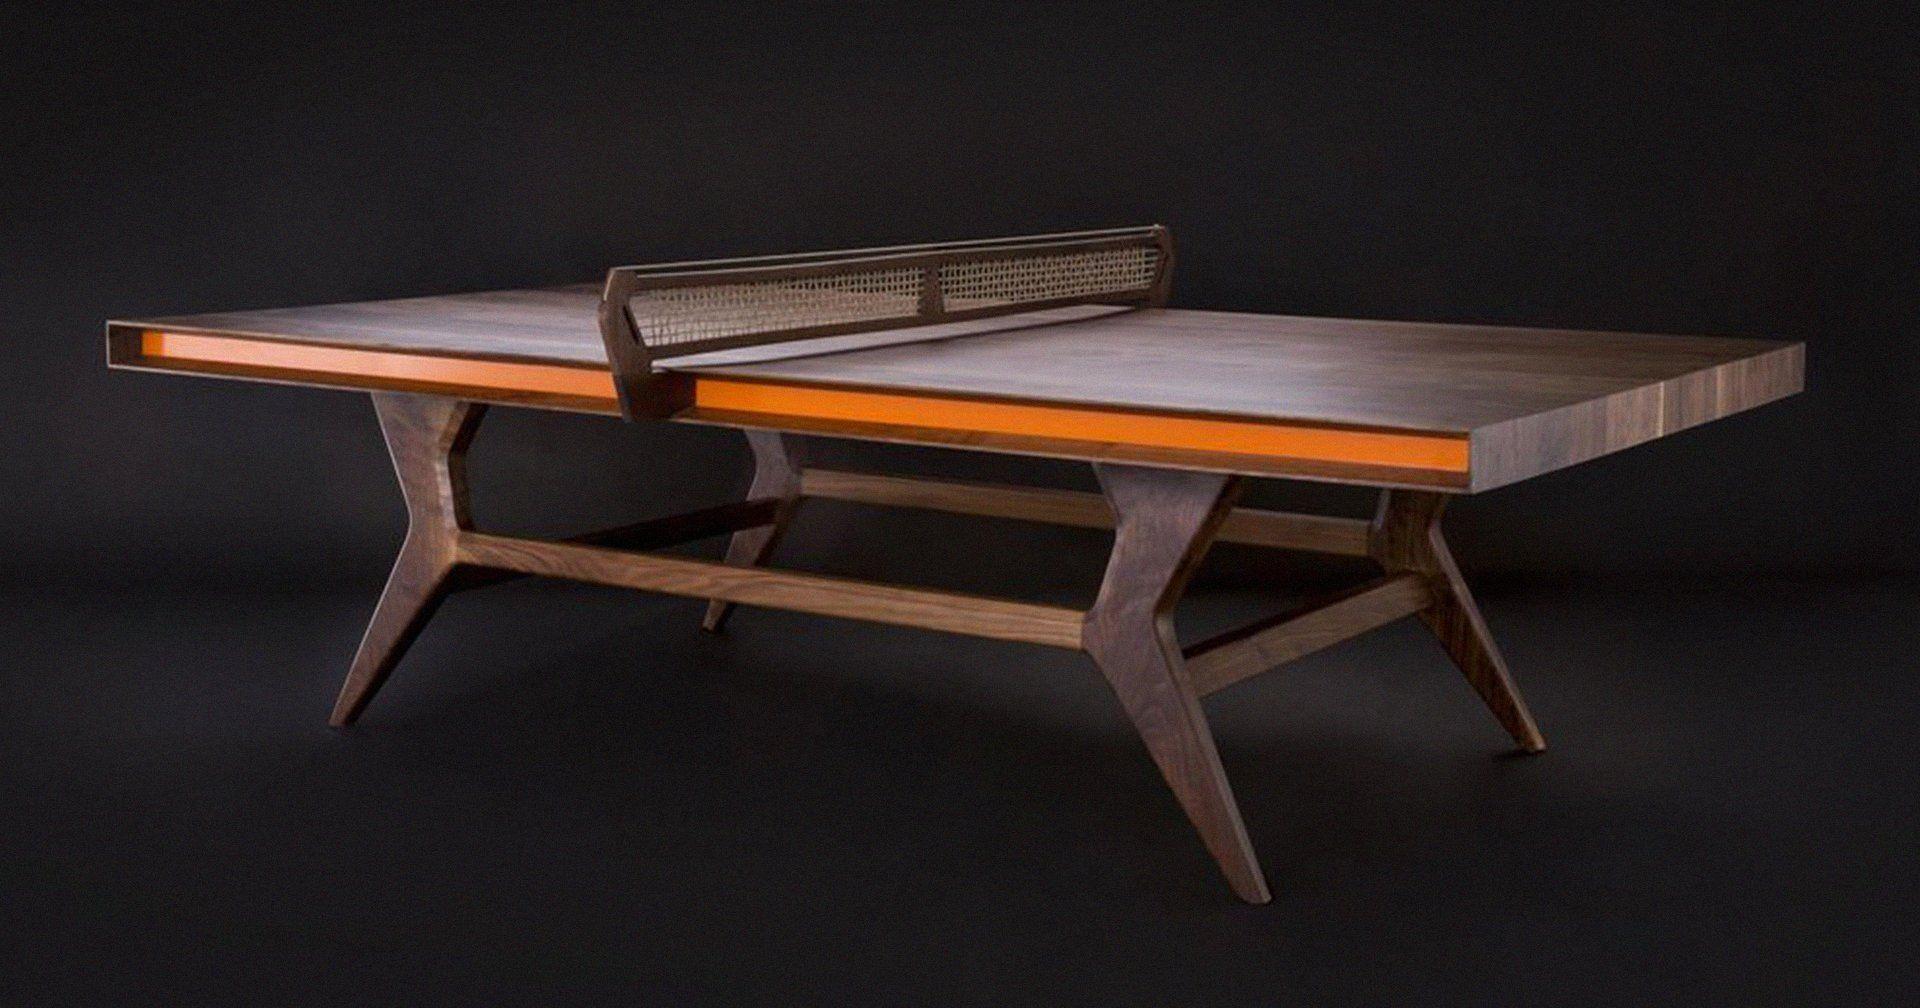 c8295e665a8e130341f1eab48757b3ad Impressionnant De Table Transformable Concept